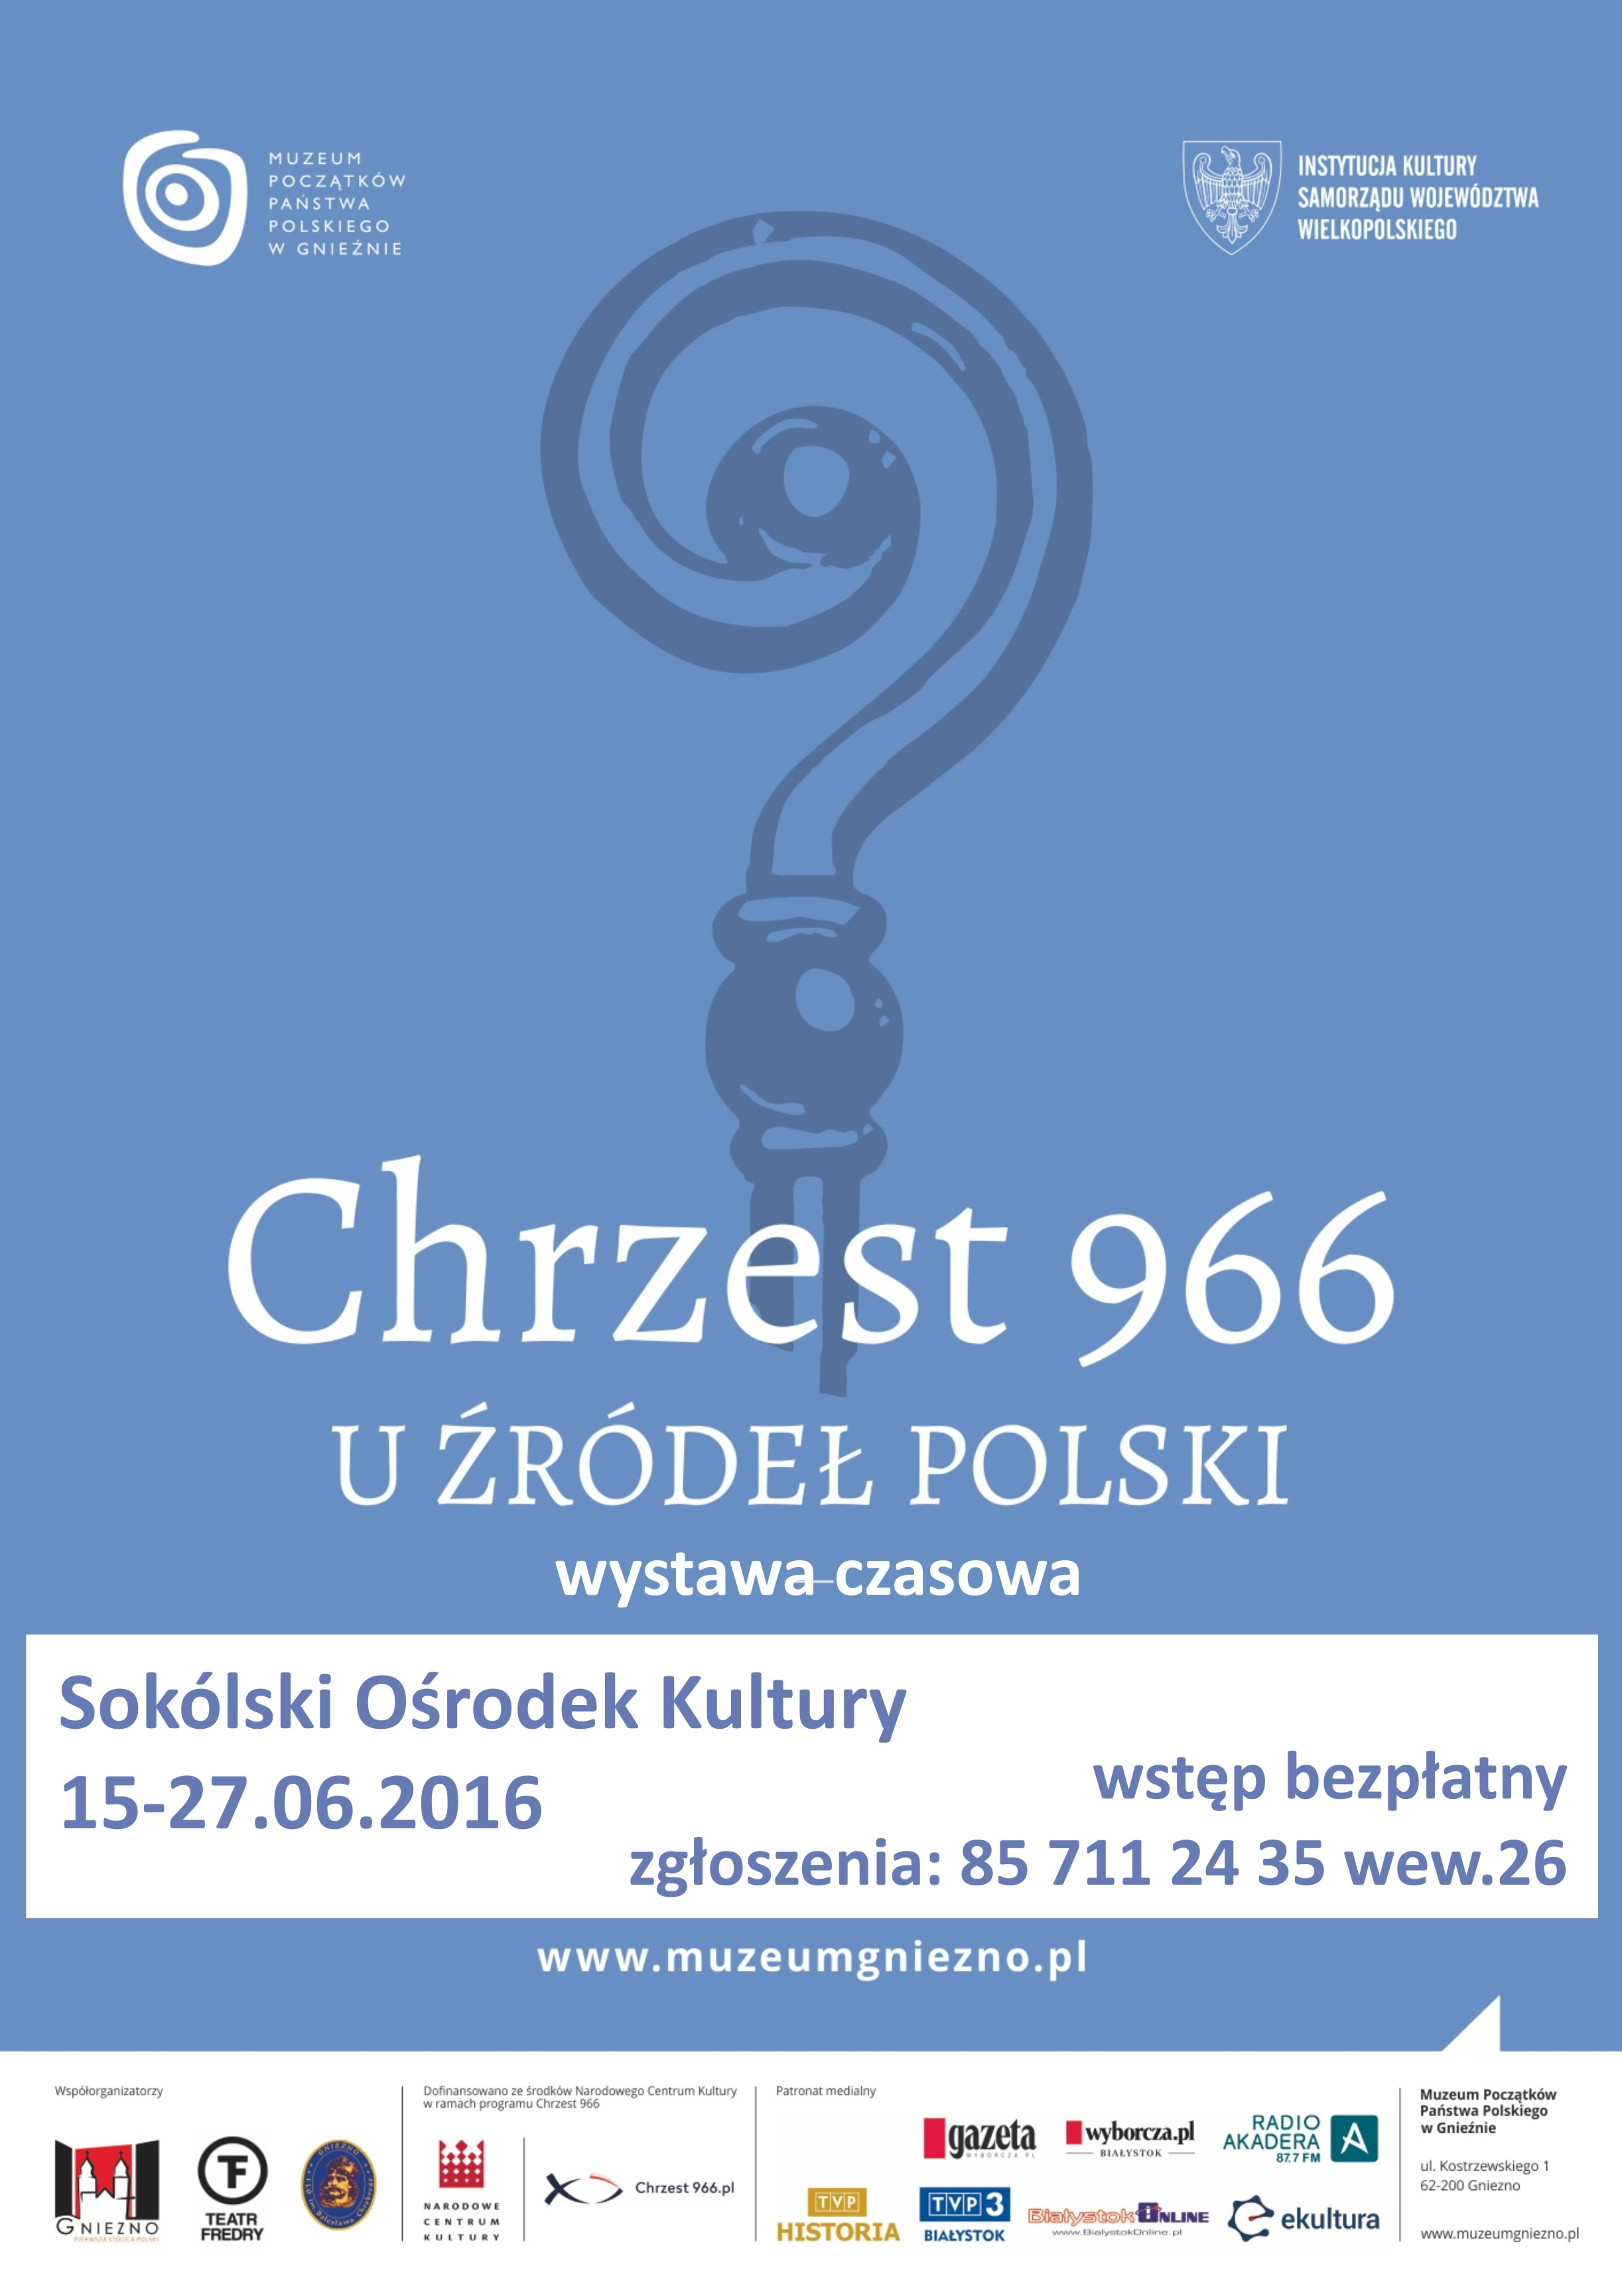 Sokółka Gmina Sokółka 104213 Urząd Miejski W Sokółce